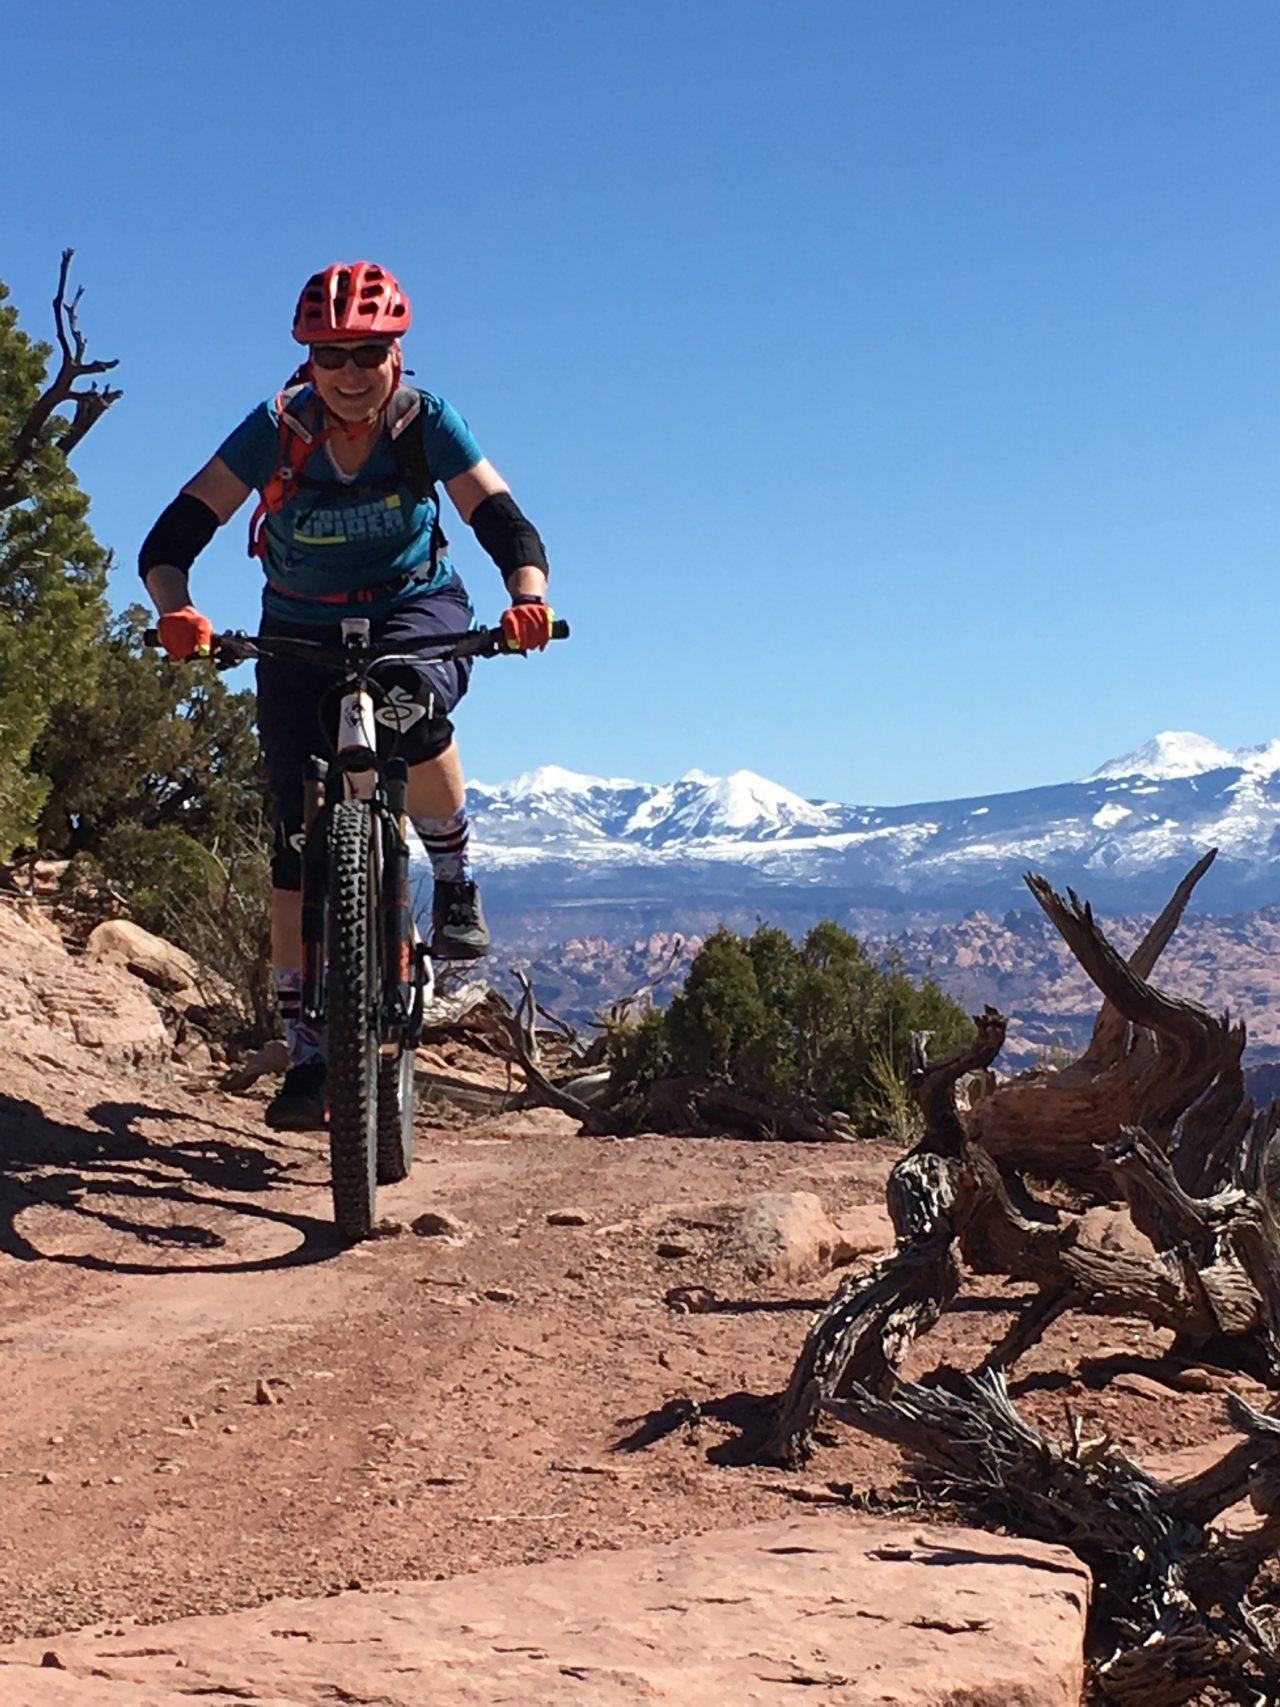 Susan enjoys Spring riding on the Intrepid trails